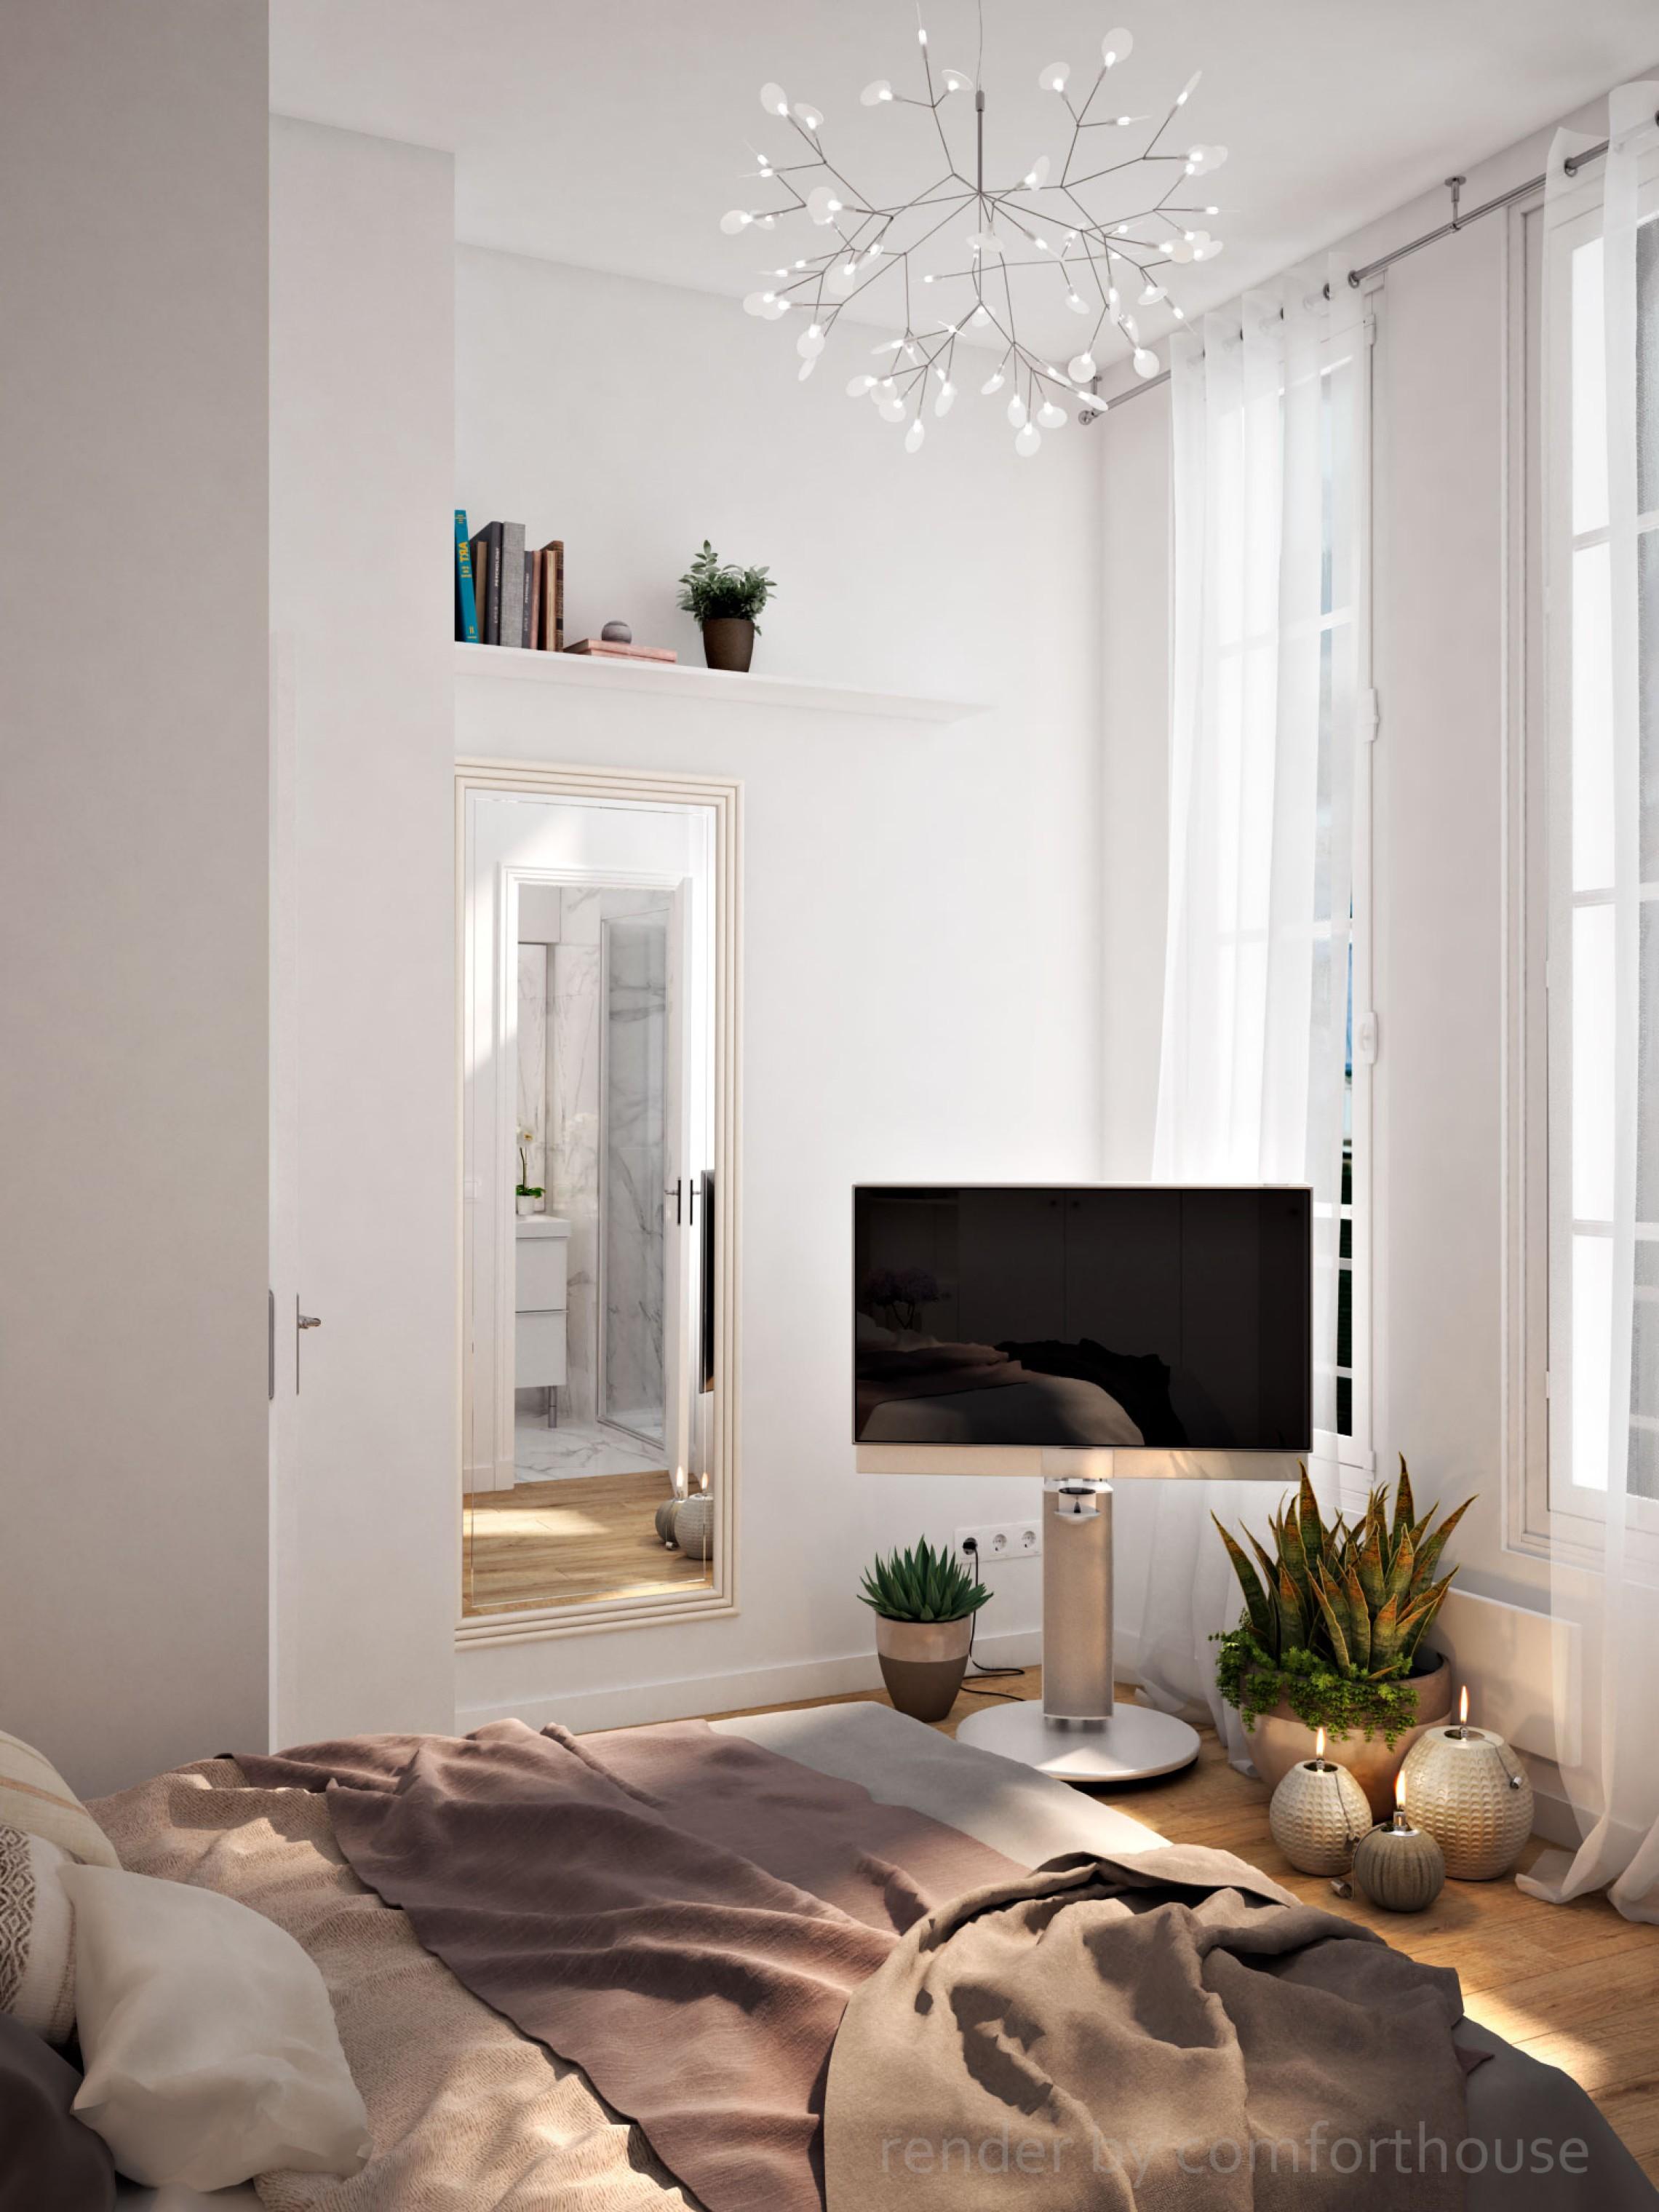 Paris interior bedroom